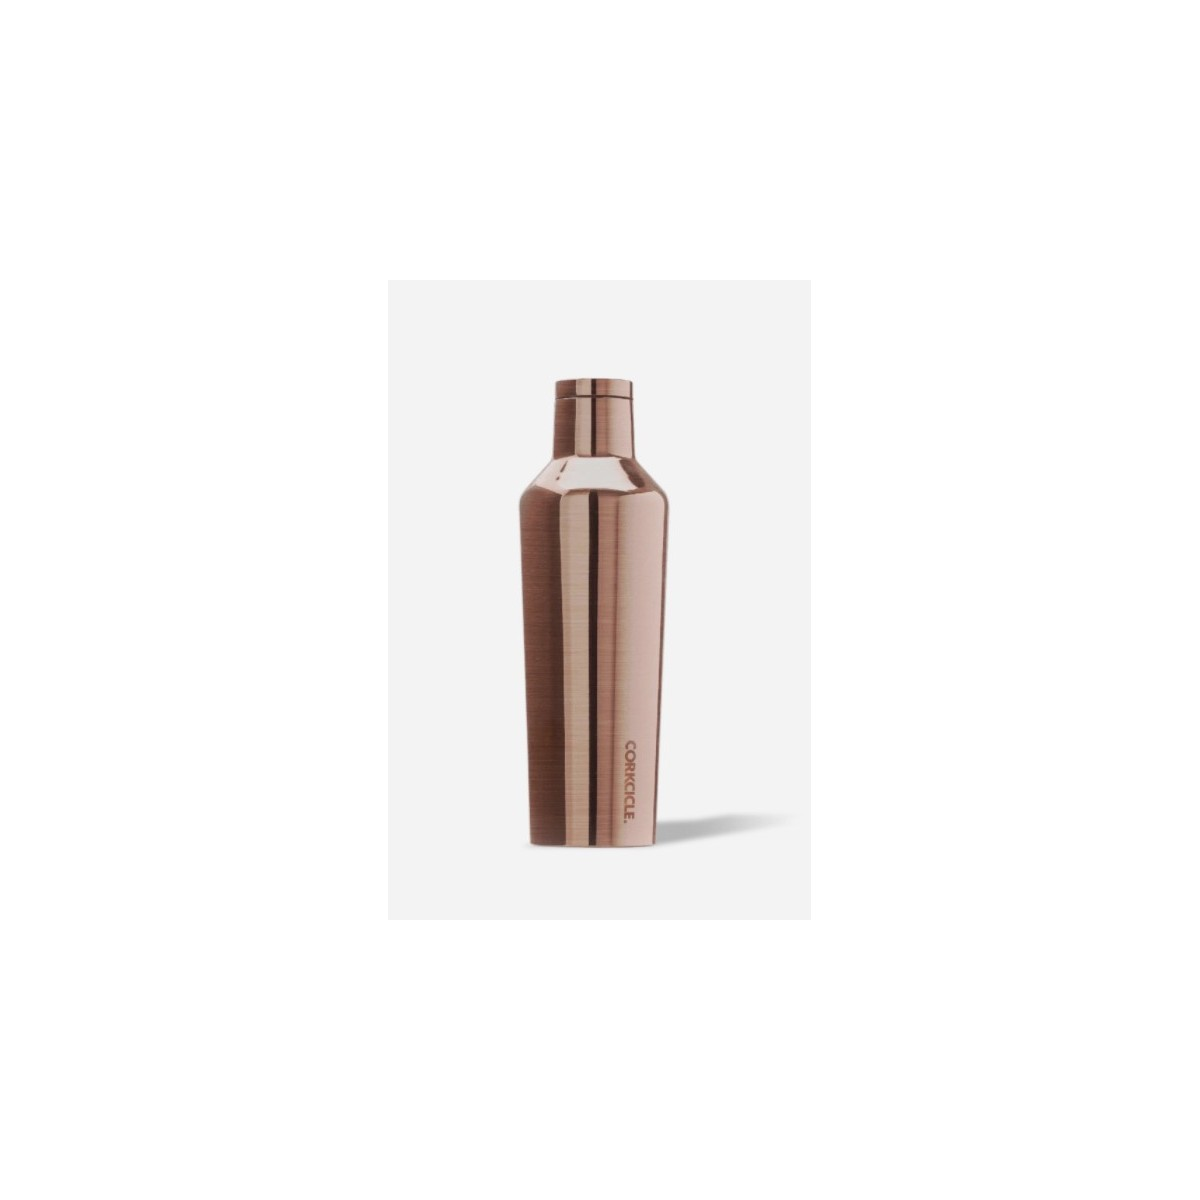 Borraccia termica - Copper 16oz